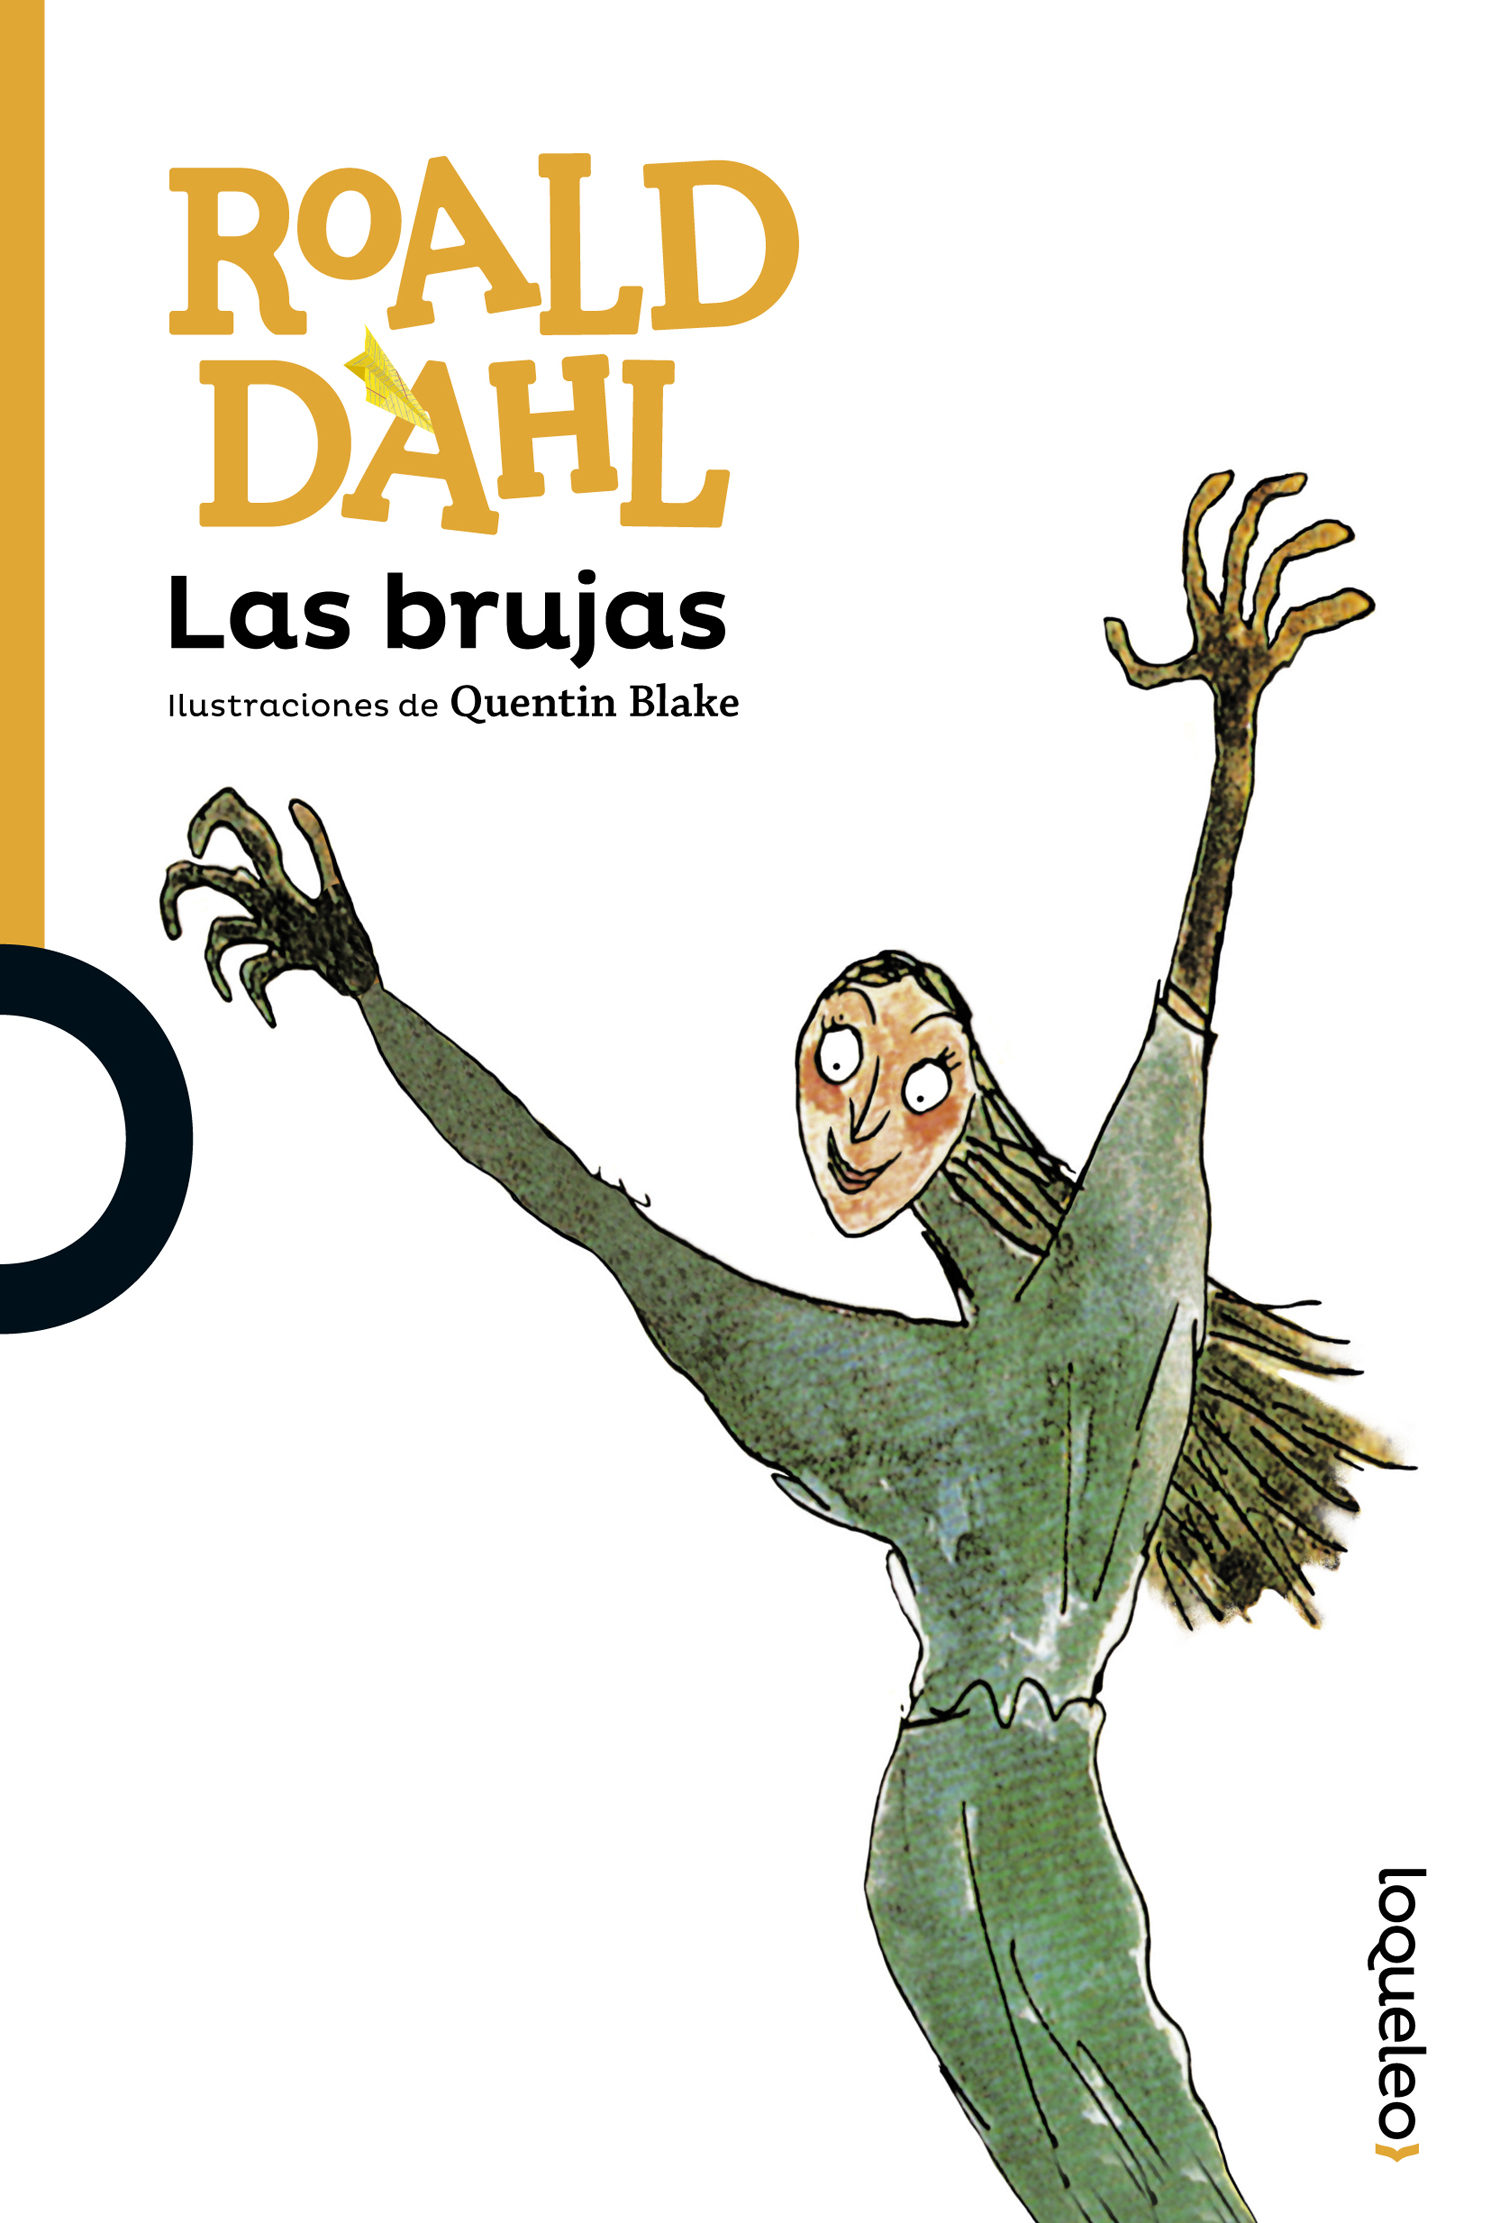 las brujas-roald dahl-9788491221005